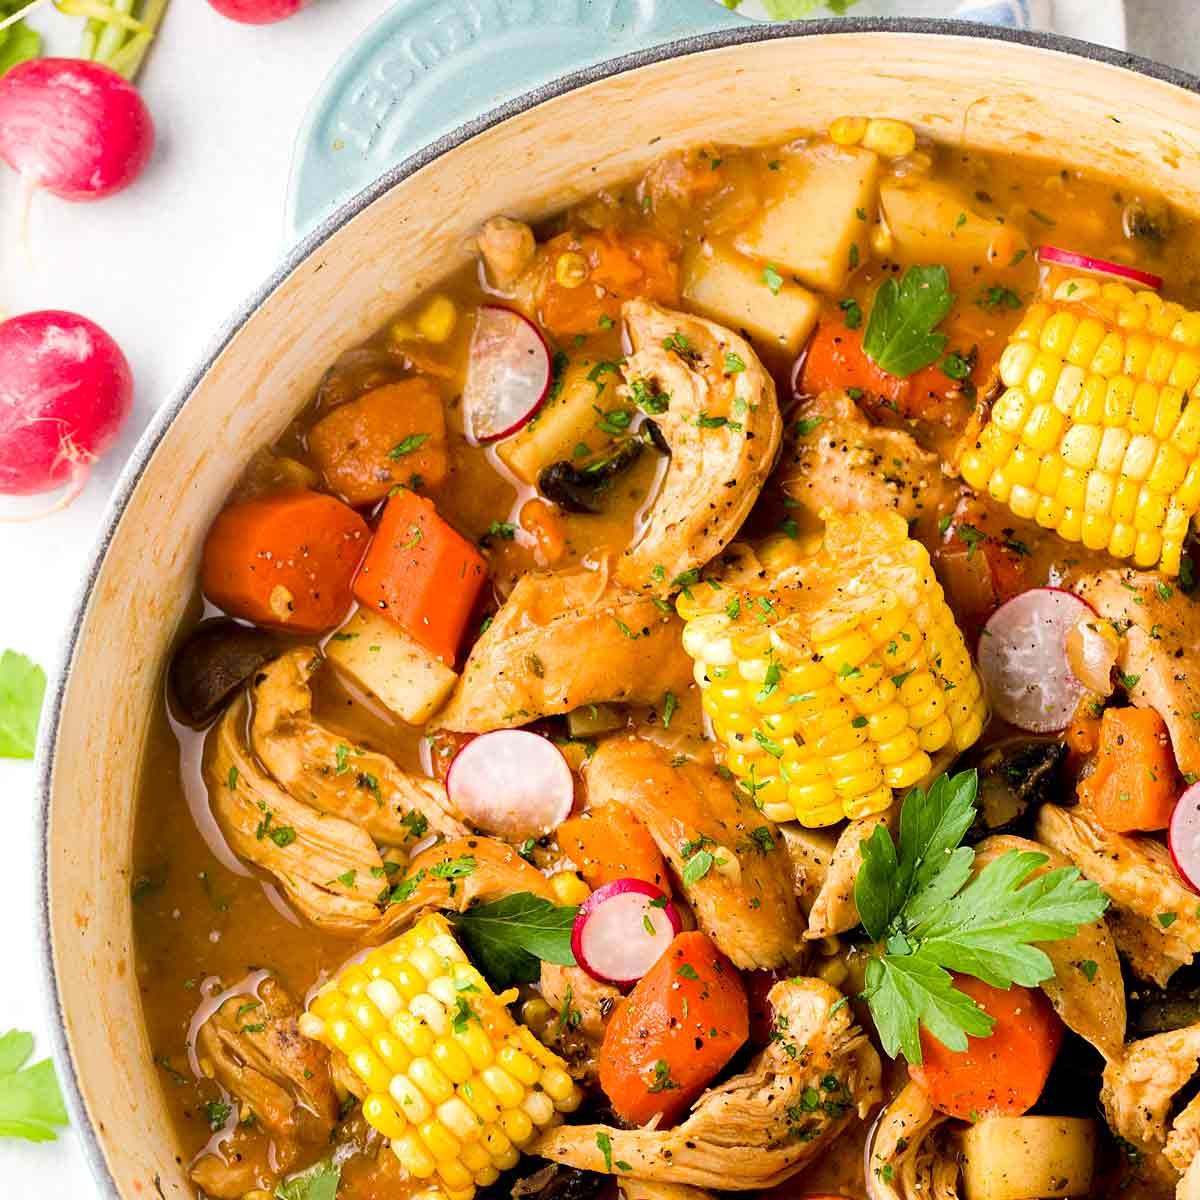 Beer-braised Chicken Stew with Vegetables | Jessica Gavin